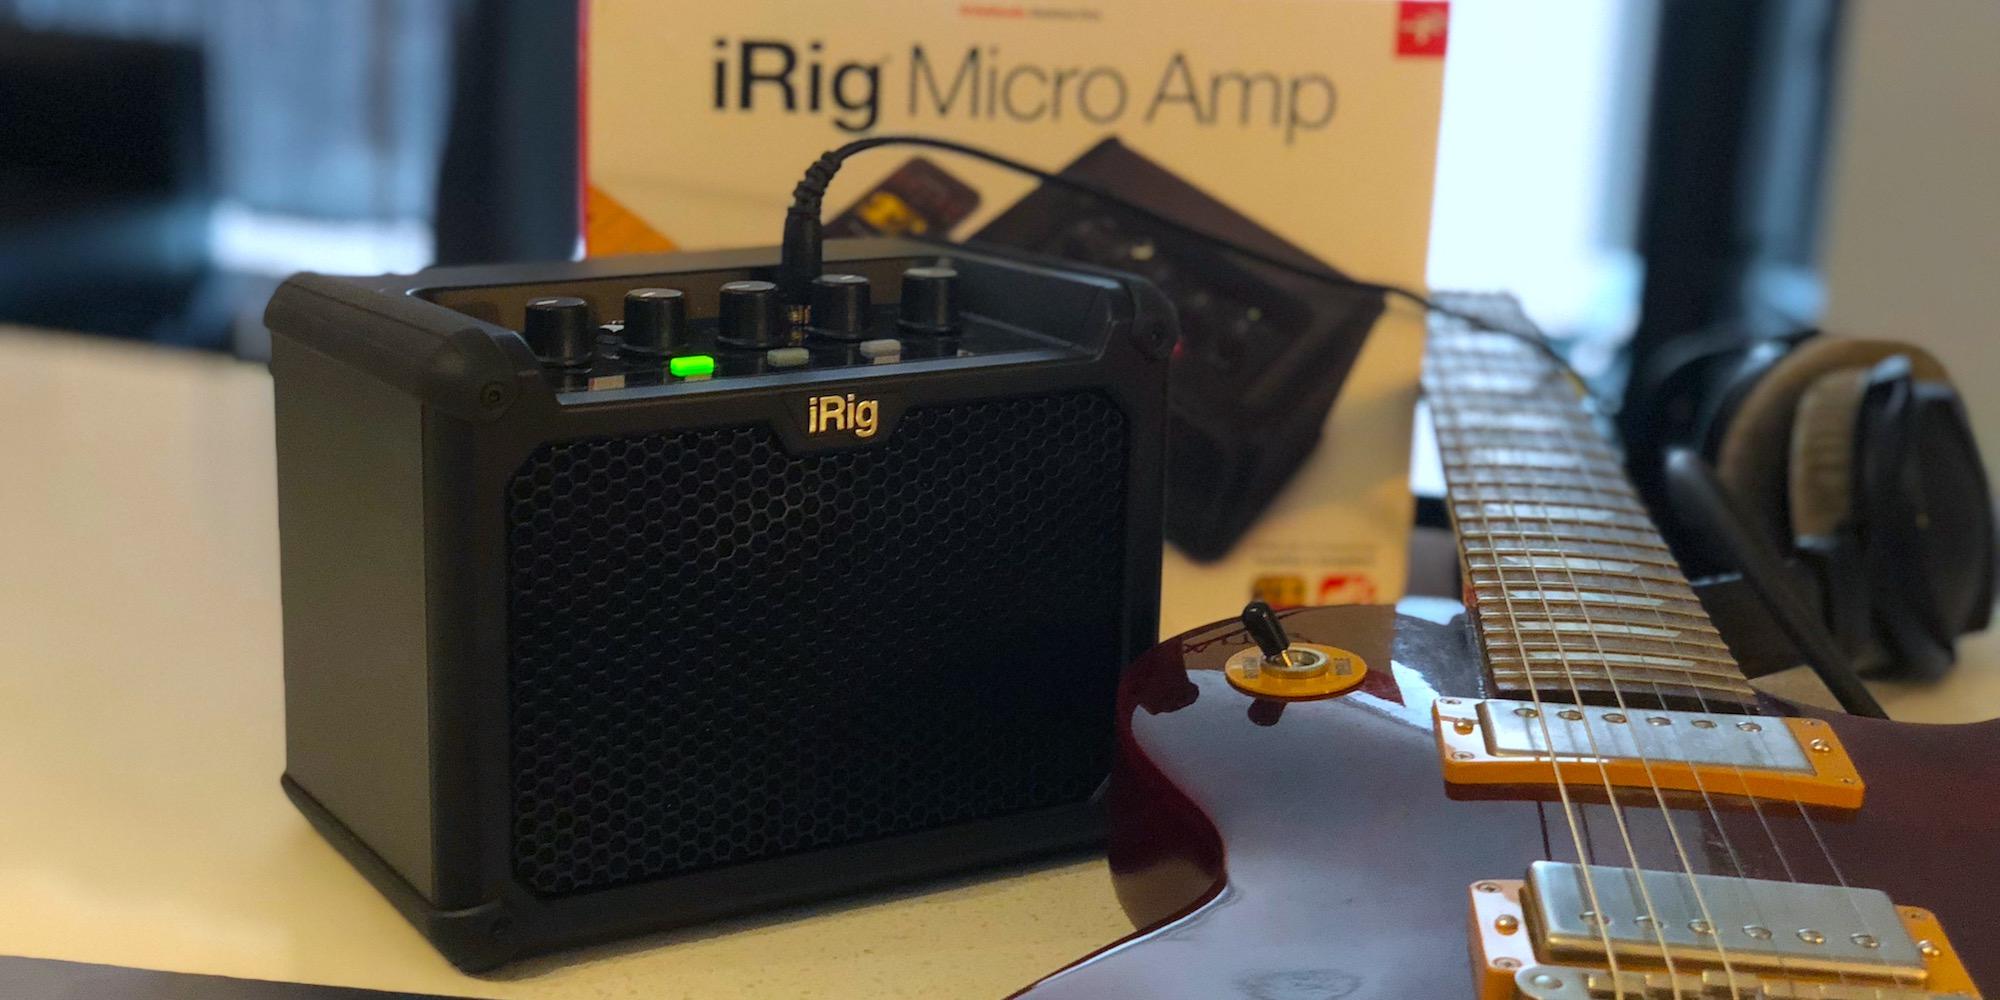 Review: iRig Micro mini guitar amp doubles as an iOS/Mac audio interface + more